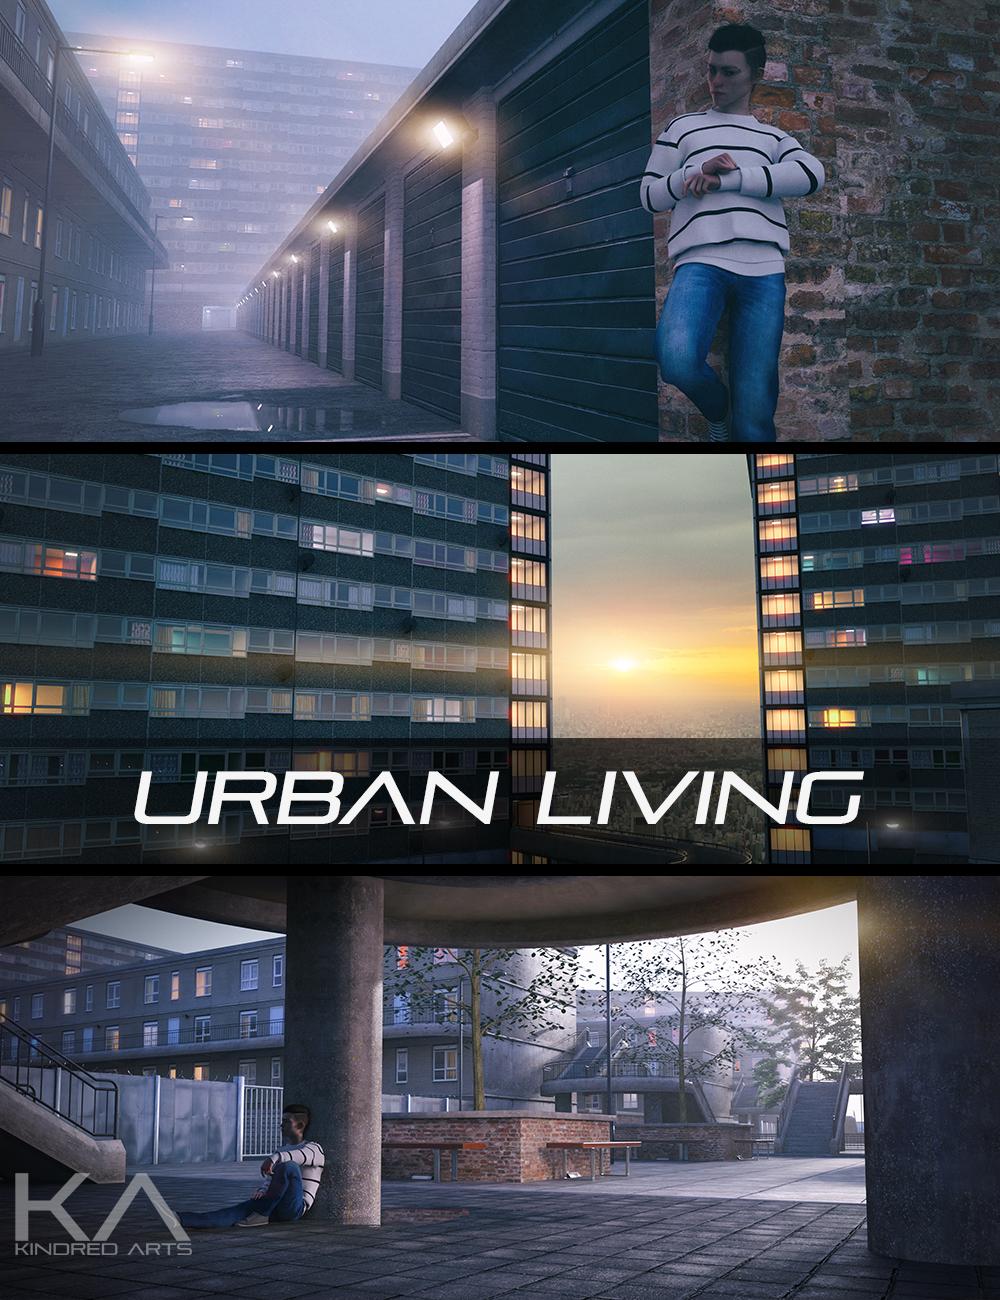 Urban Living by: KindredArts, 3D Models by Daz 3D